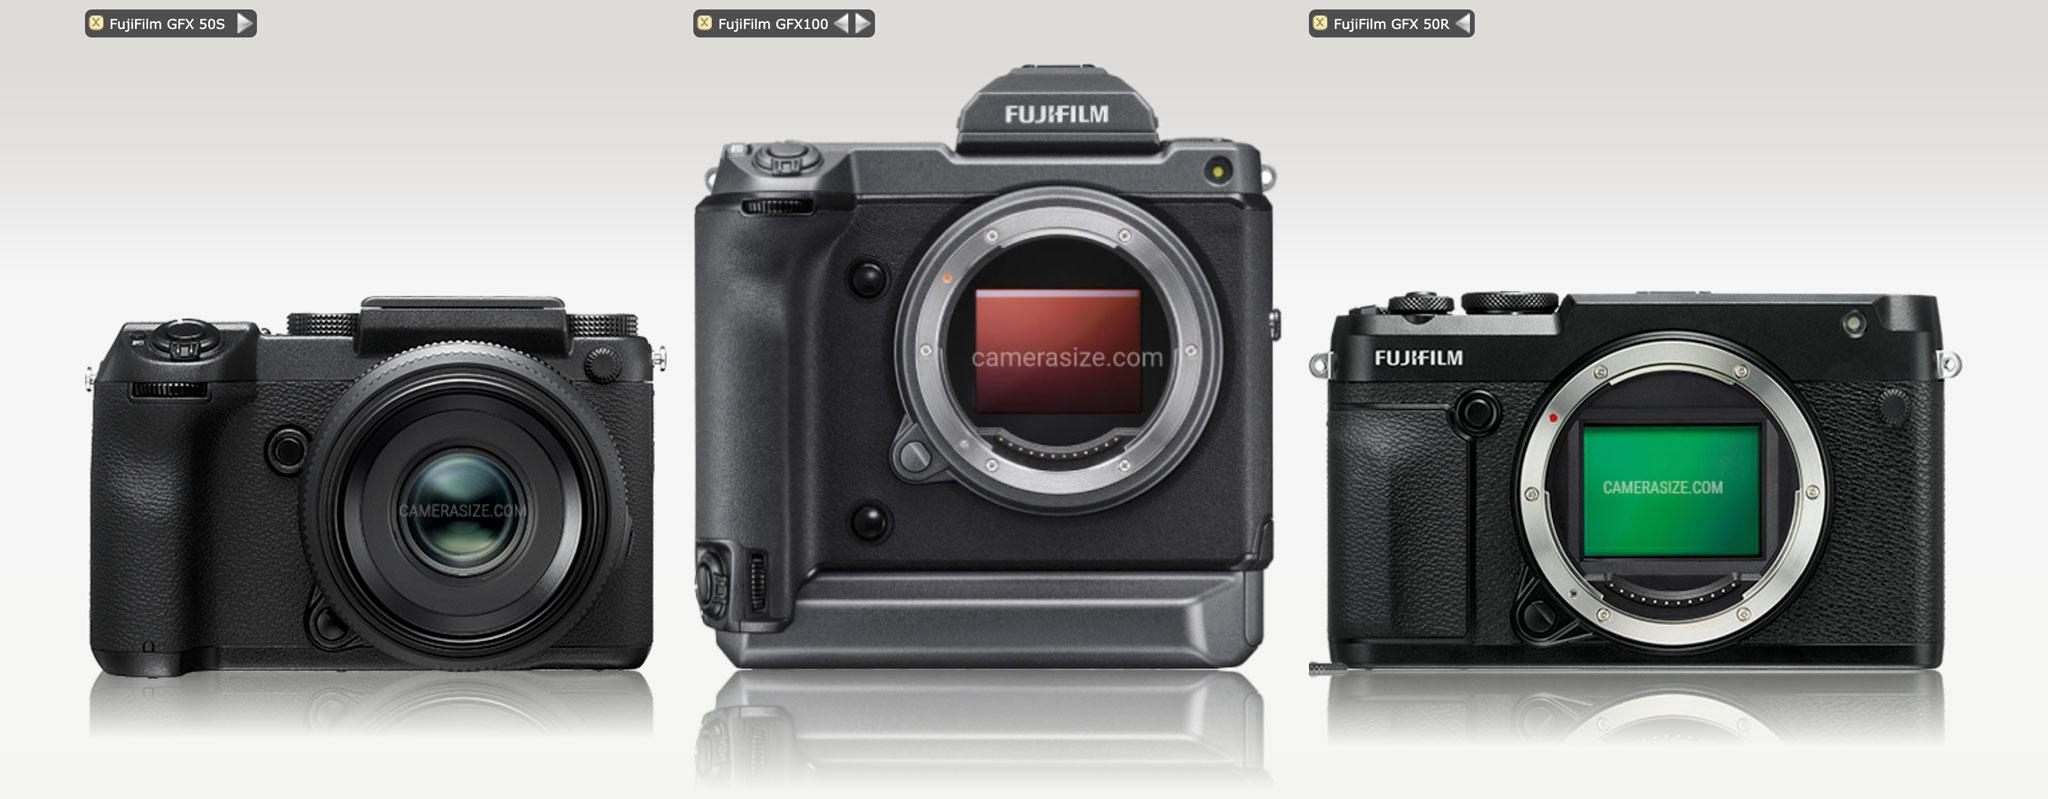 GFX50S-GFX100-GFX50R-truoc.jpg